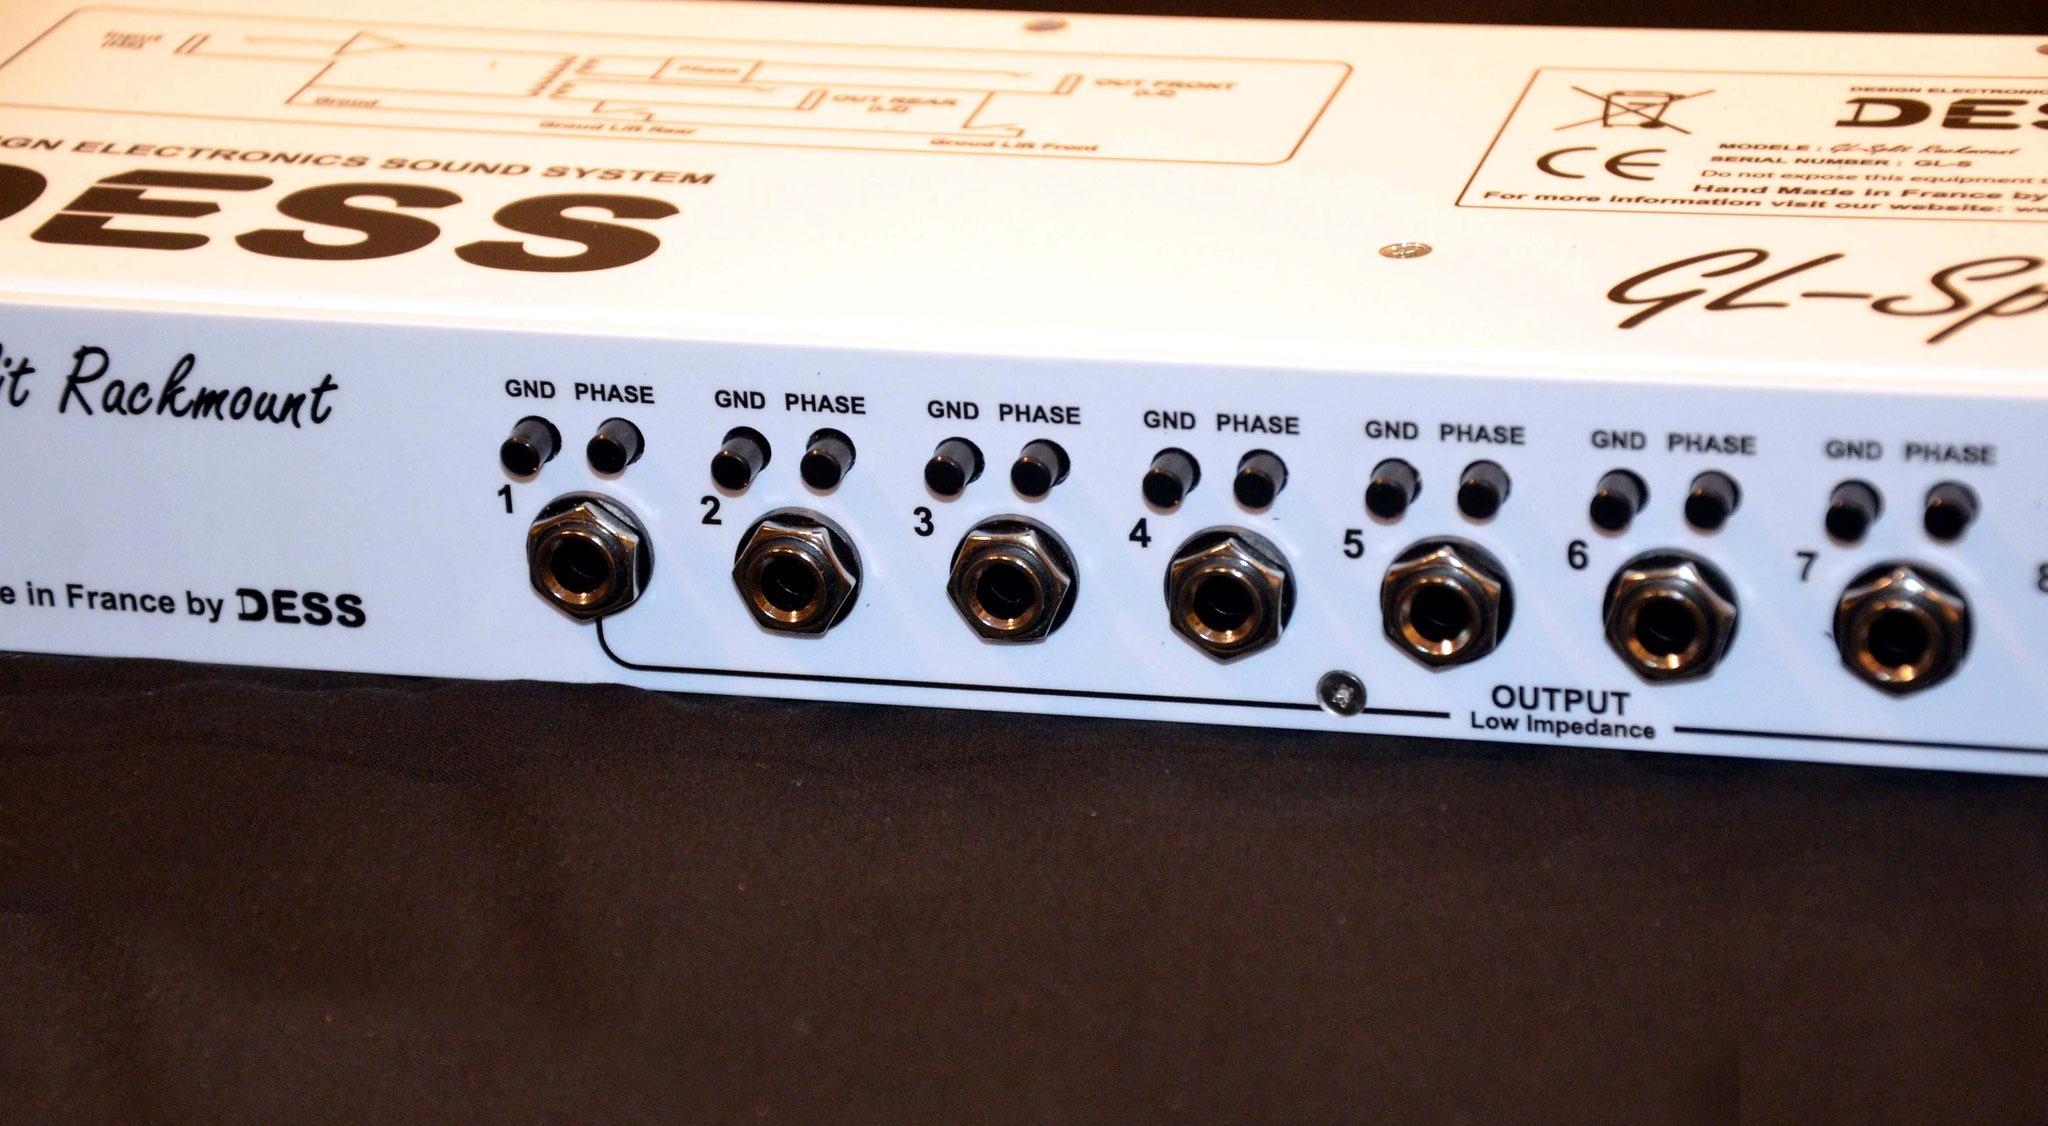 Splitter,  isolateur,  ground lift, 10 voies, Mono, phase, guitare, basse, GL-Split Rackmount